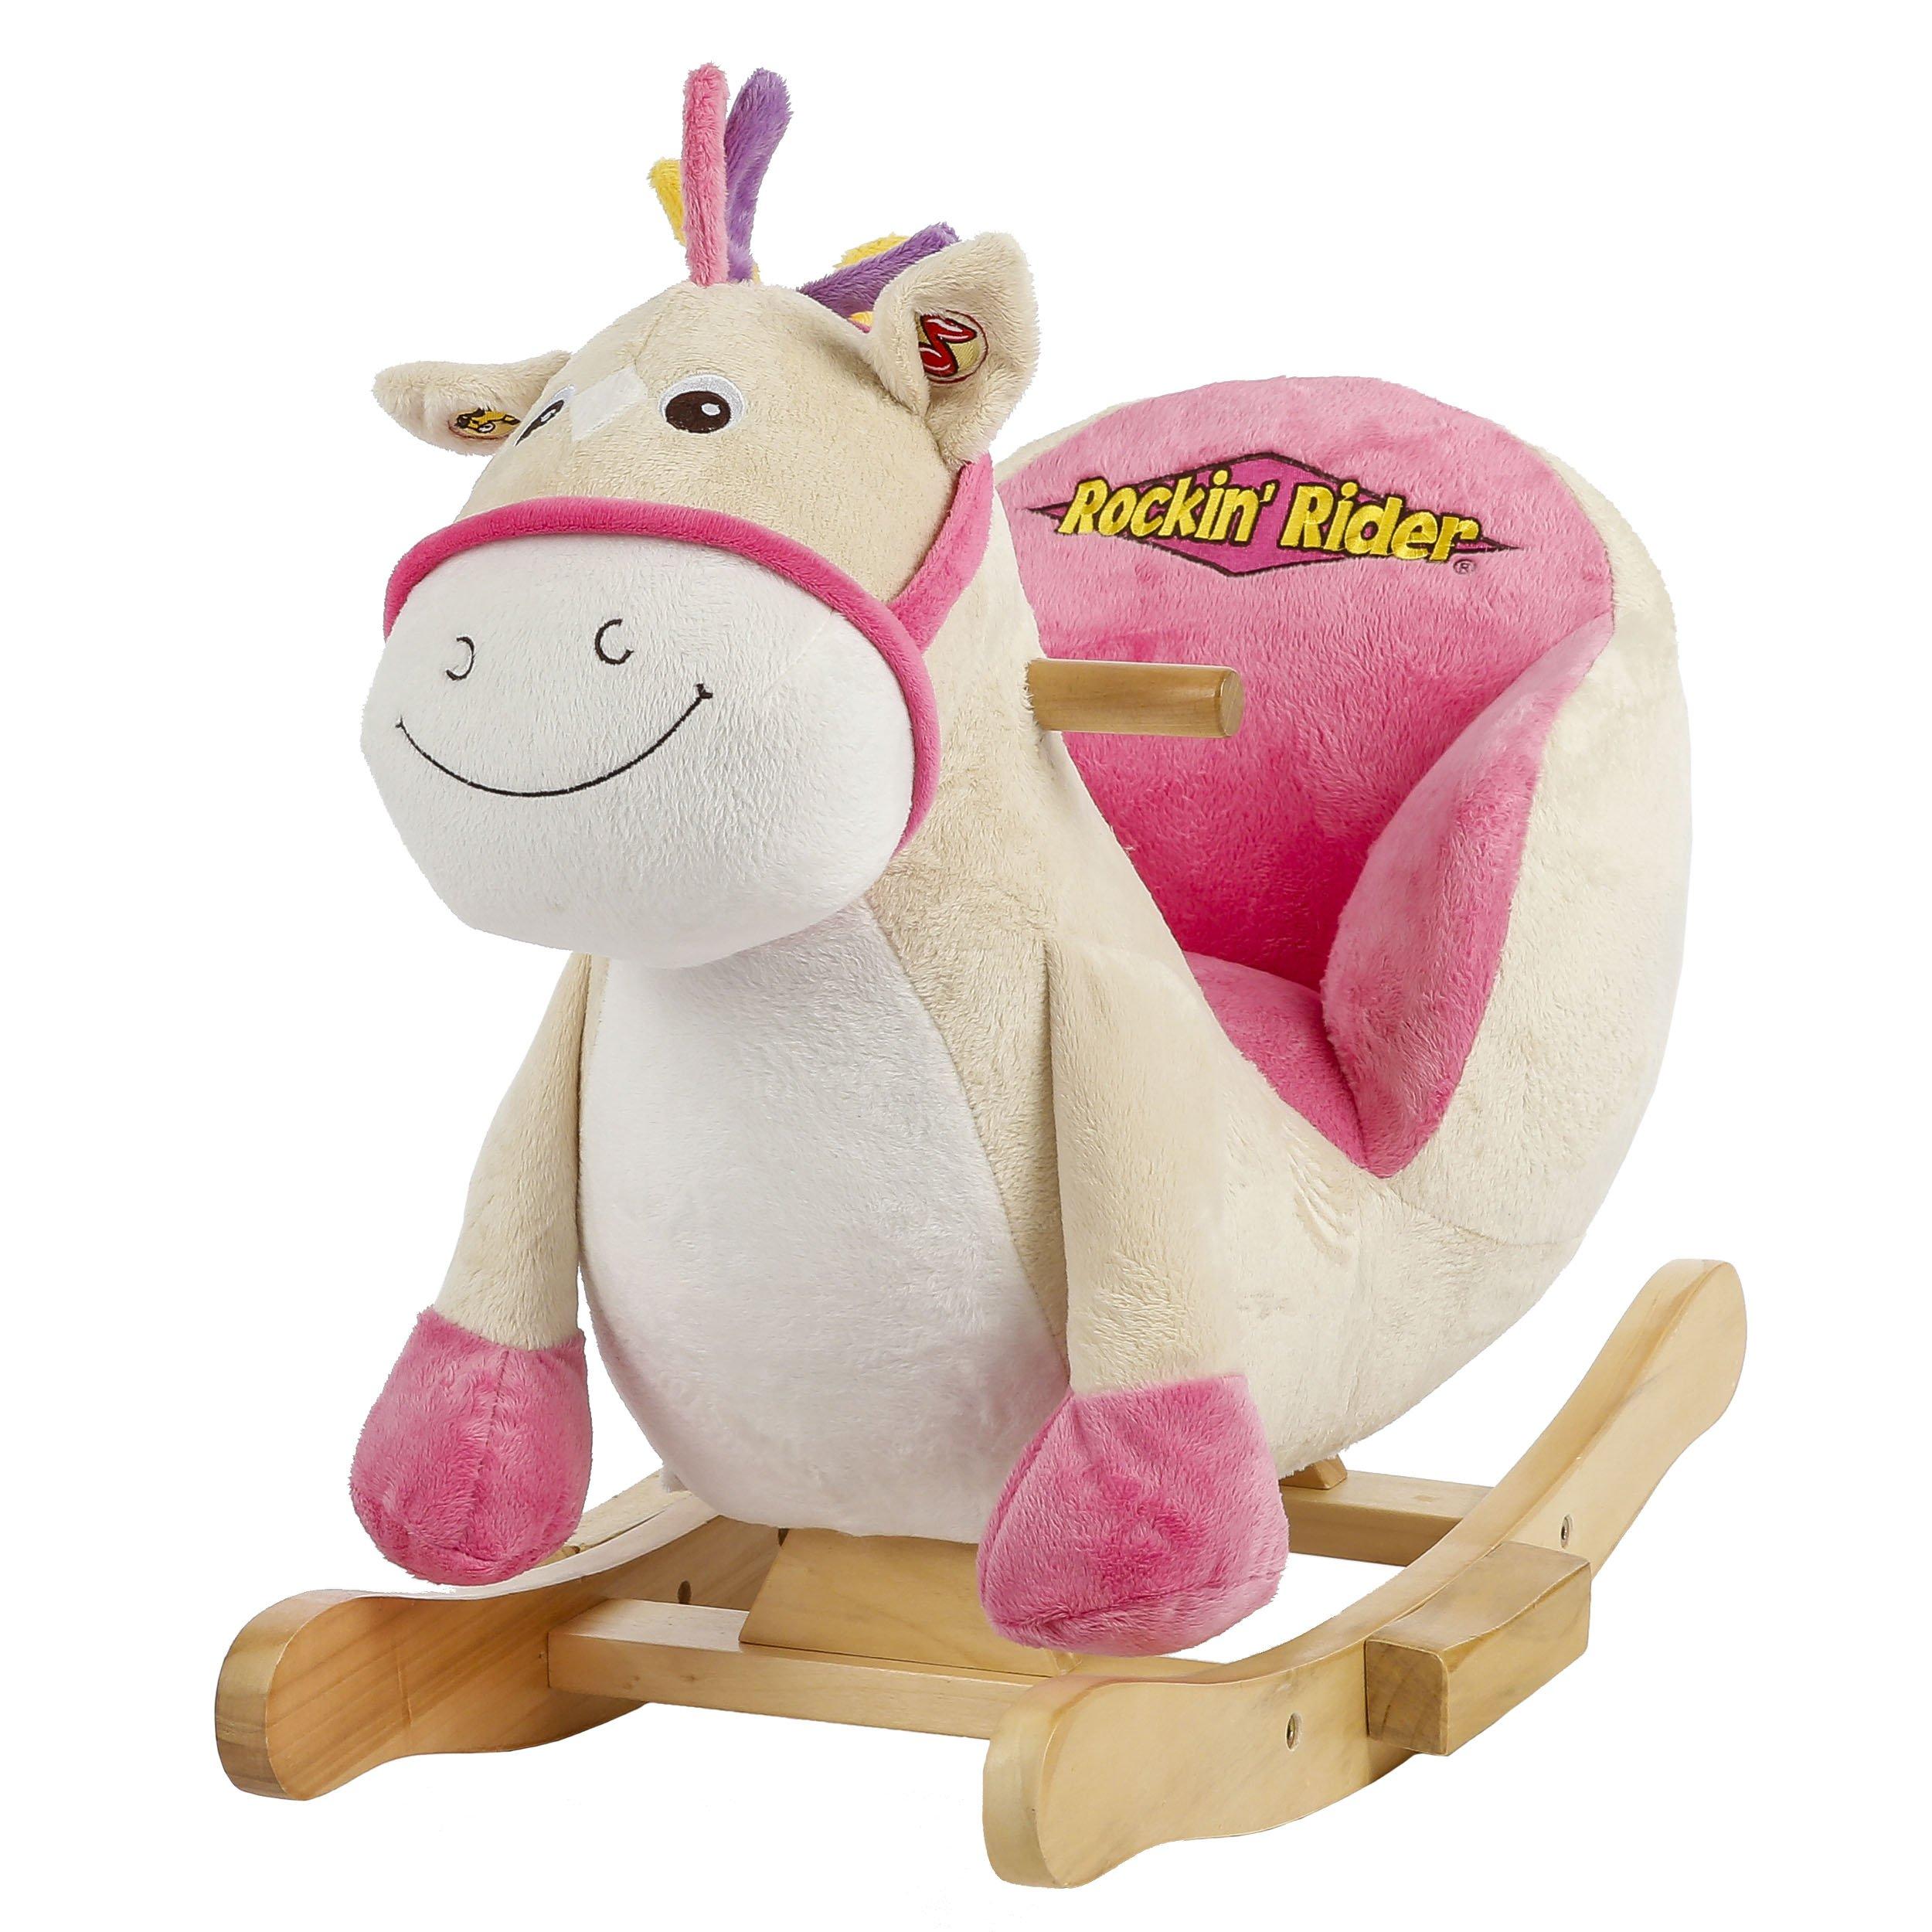 Rockin' Rider Giggles Baby Rocker Ride On